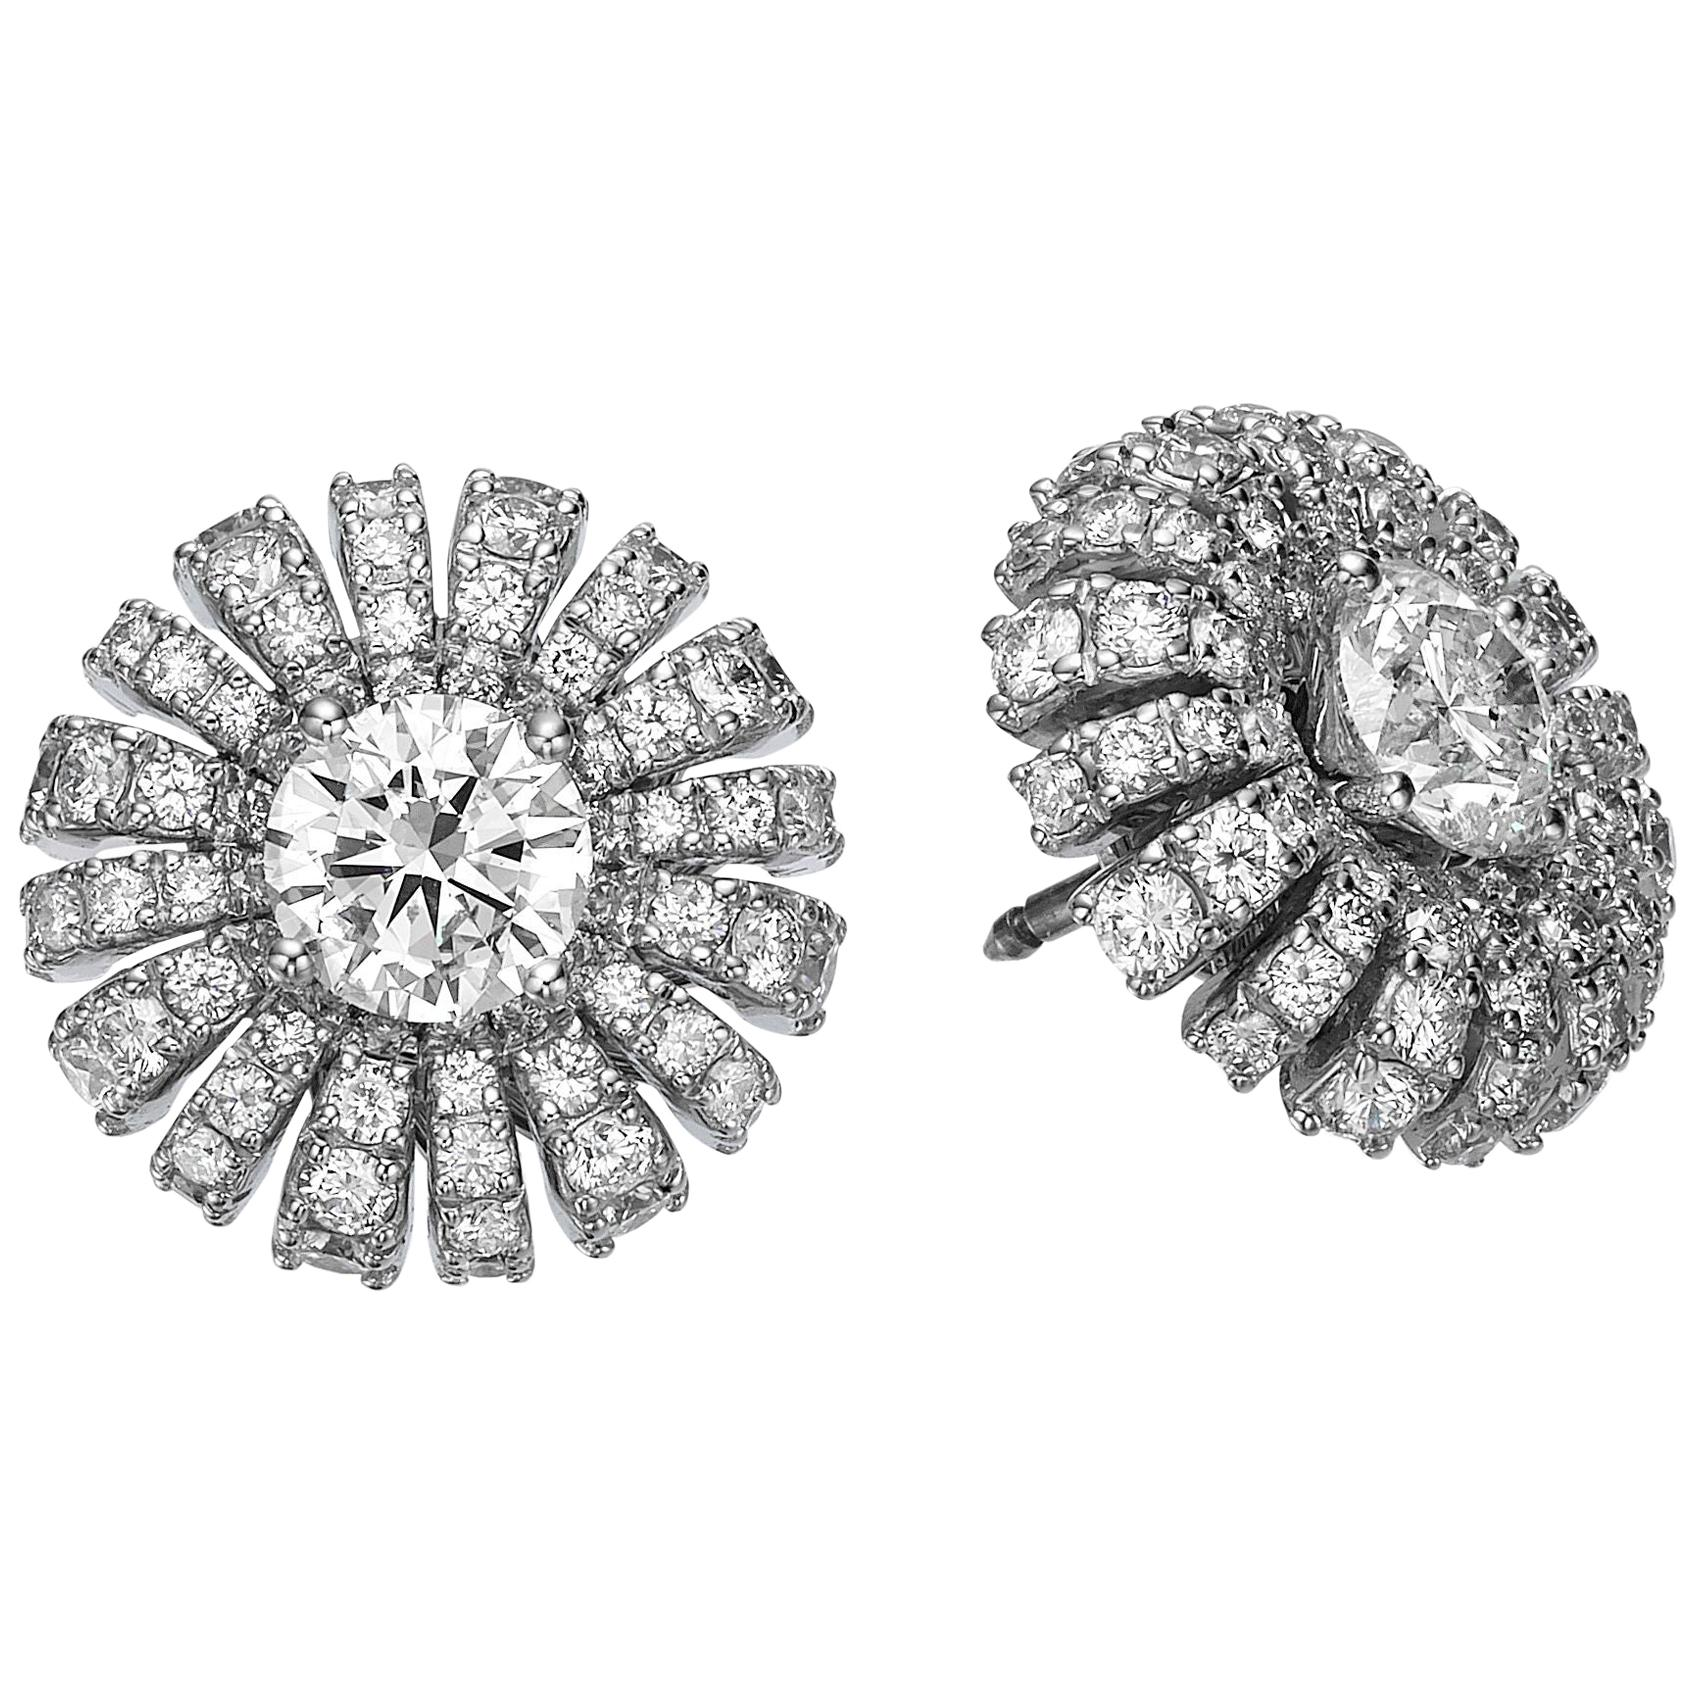 EGL Certified Interchangeable Diamond Floral Earring set -Sapphires & Emeralds